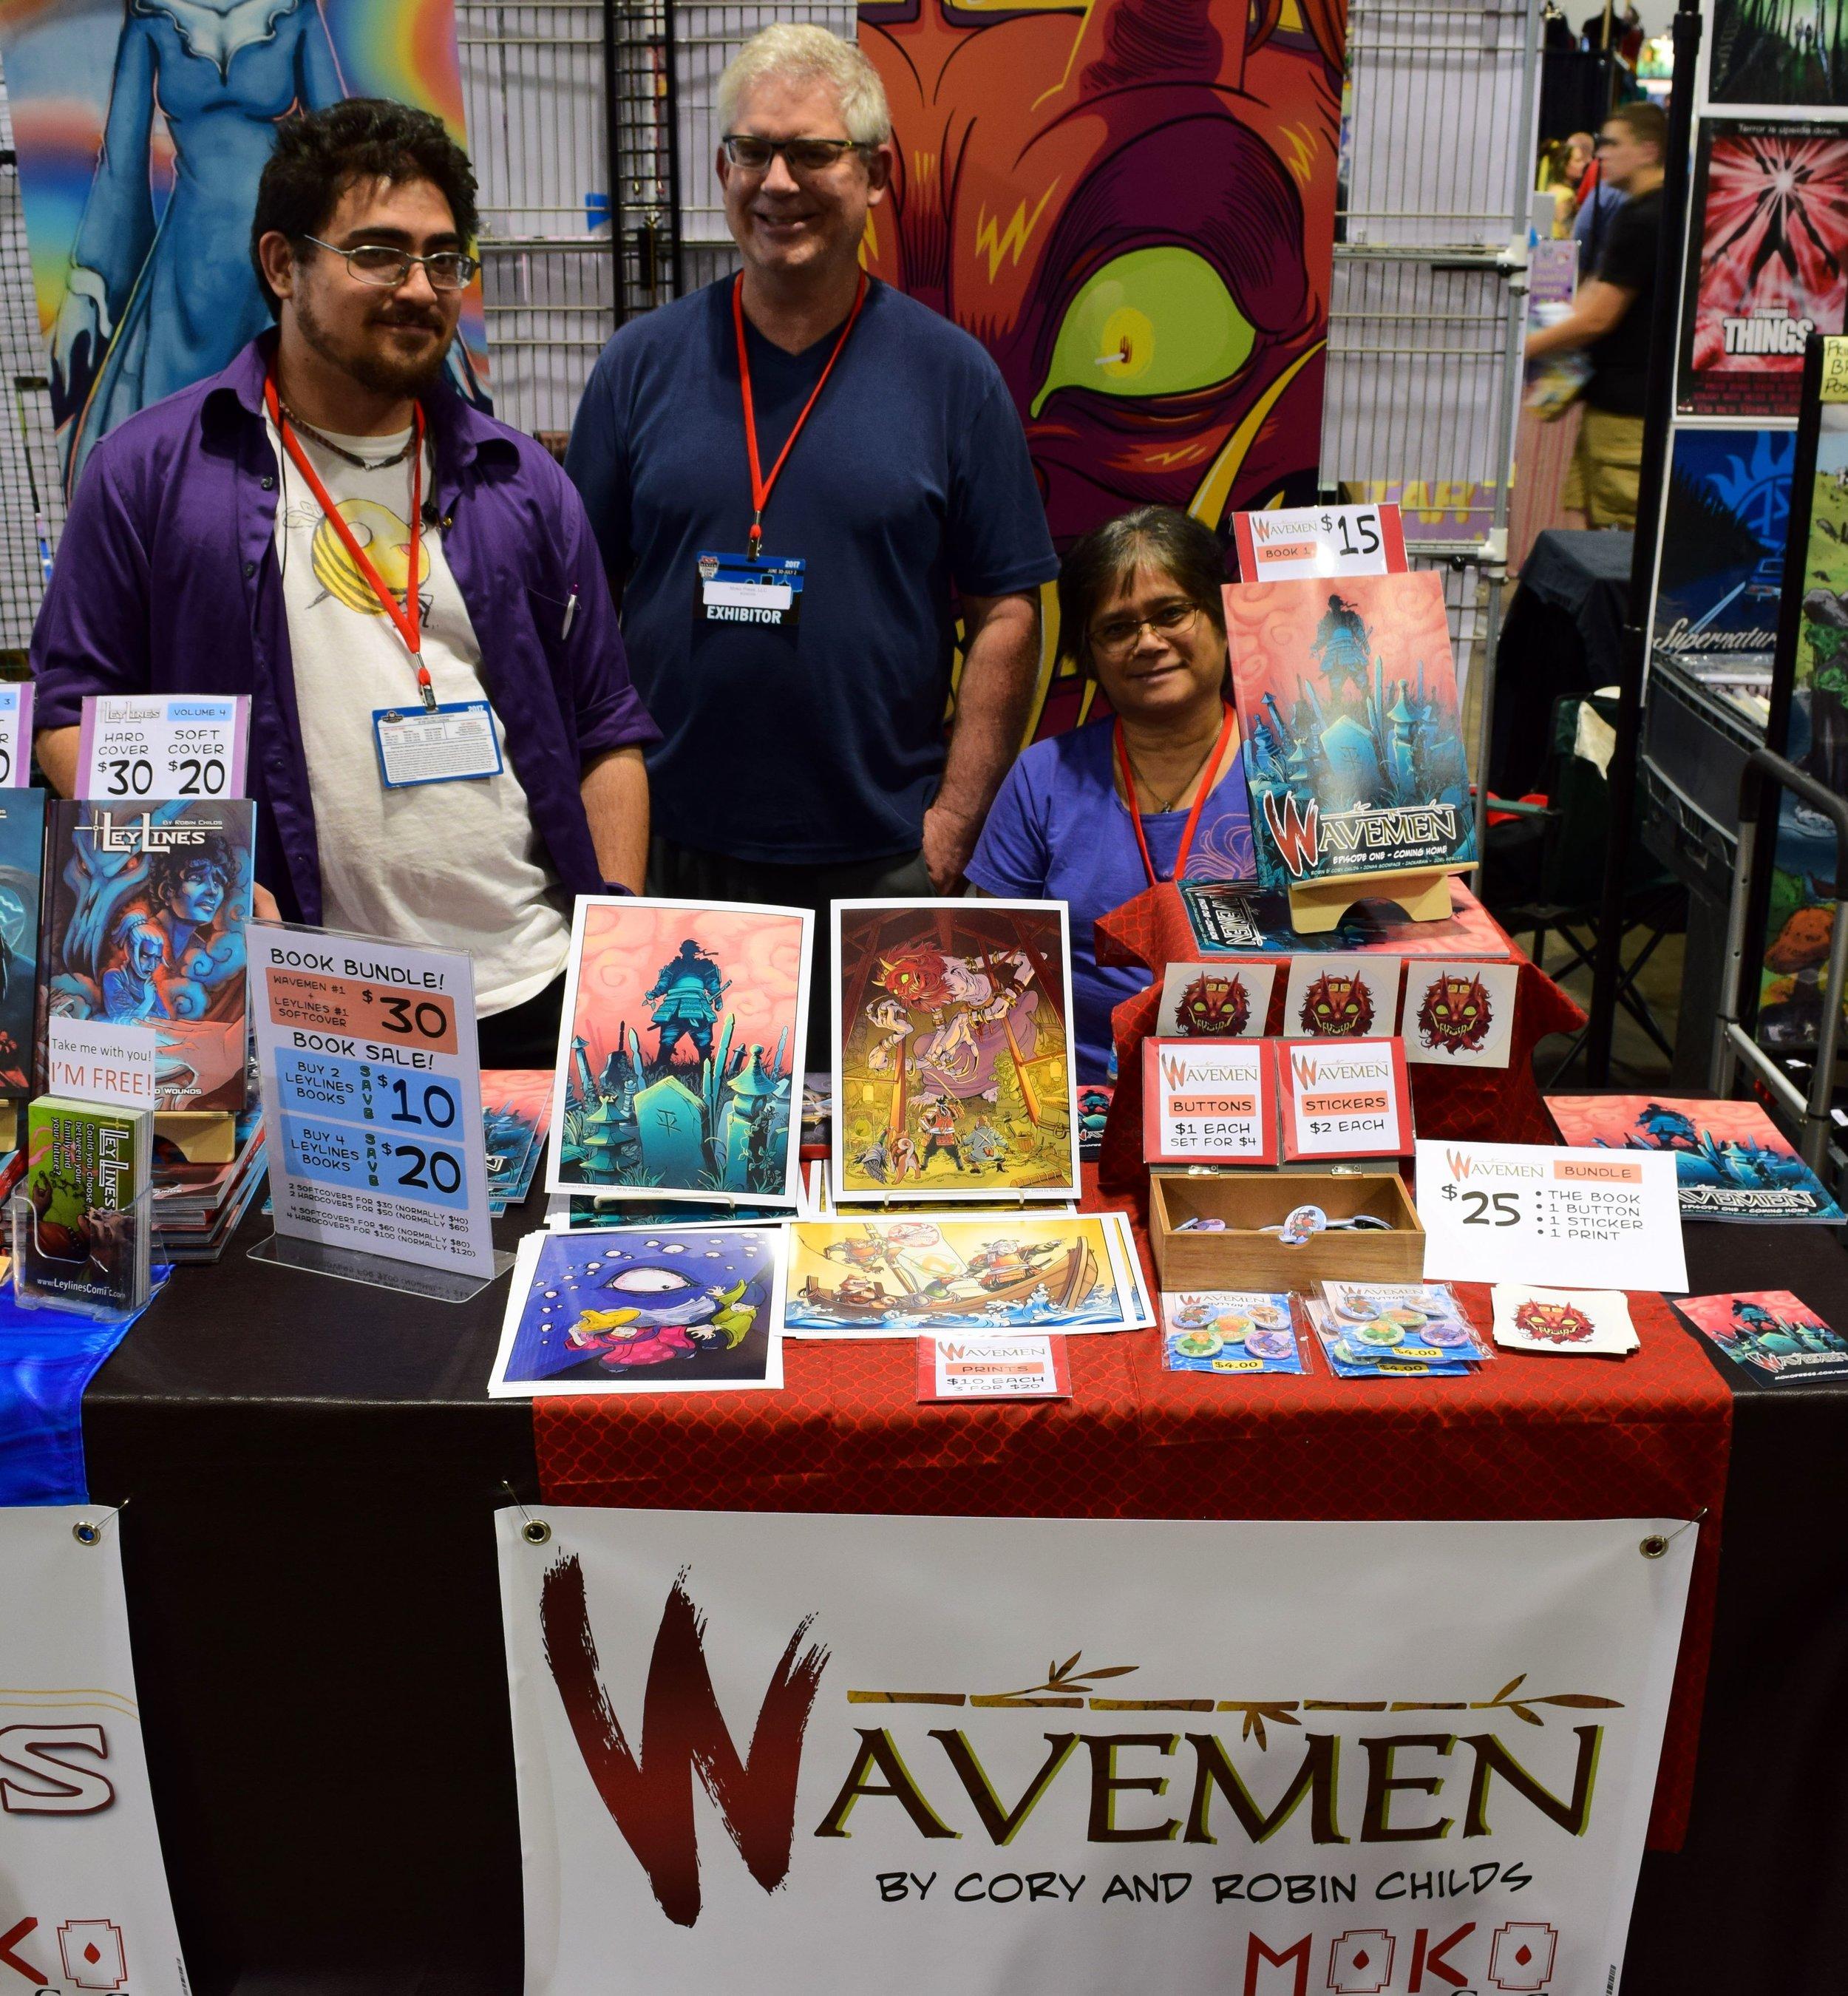 The Wavemen table at Denver Comic Con 2017.